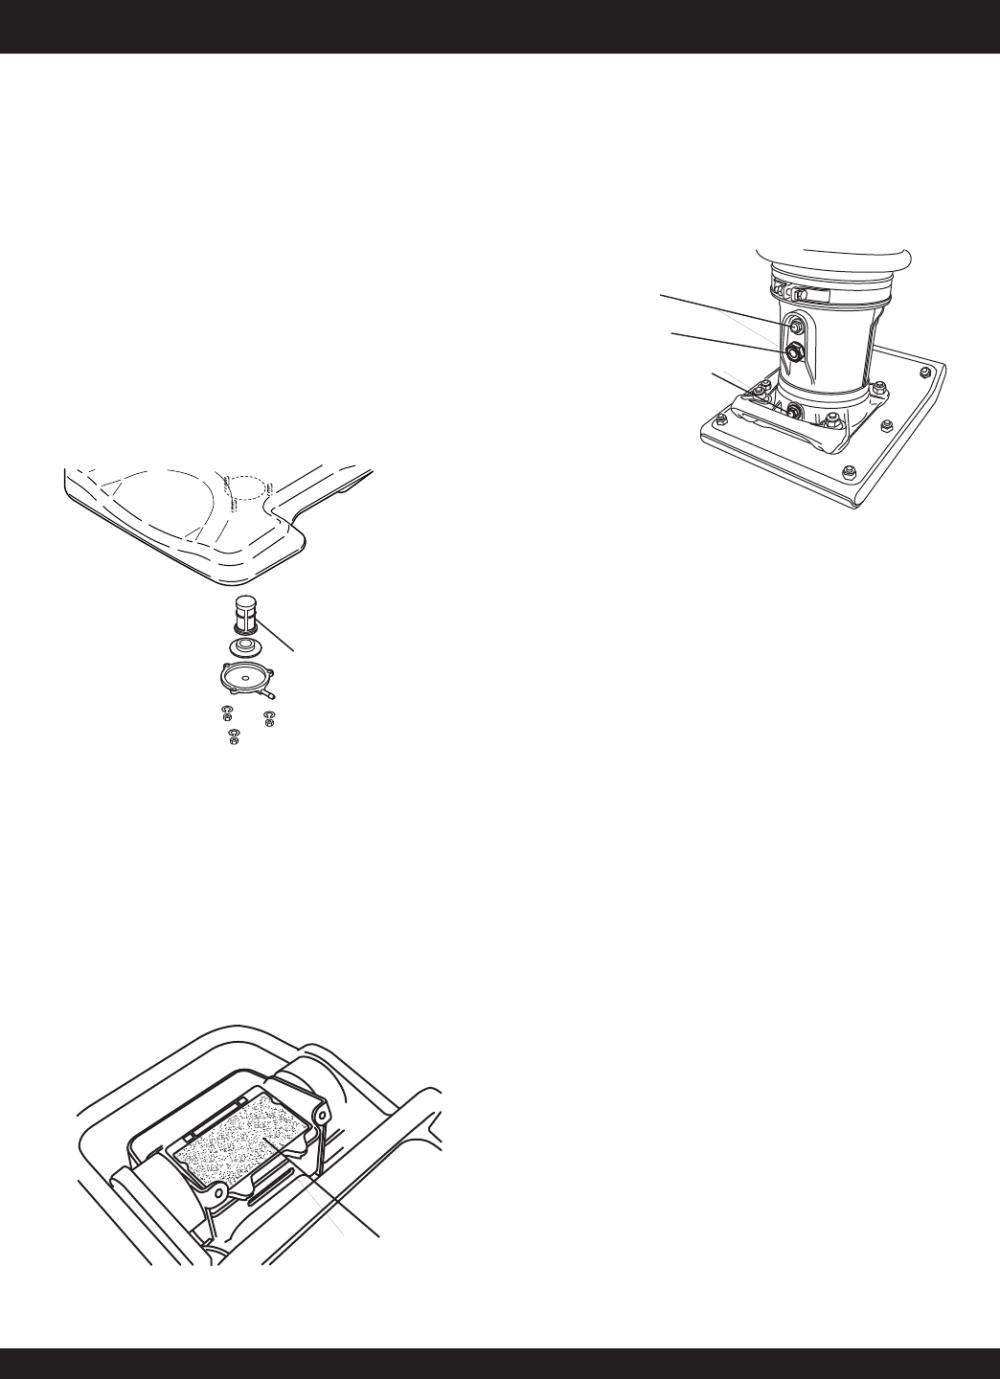 medium resolution of multiquip fuel filter